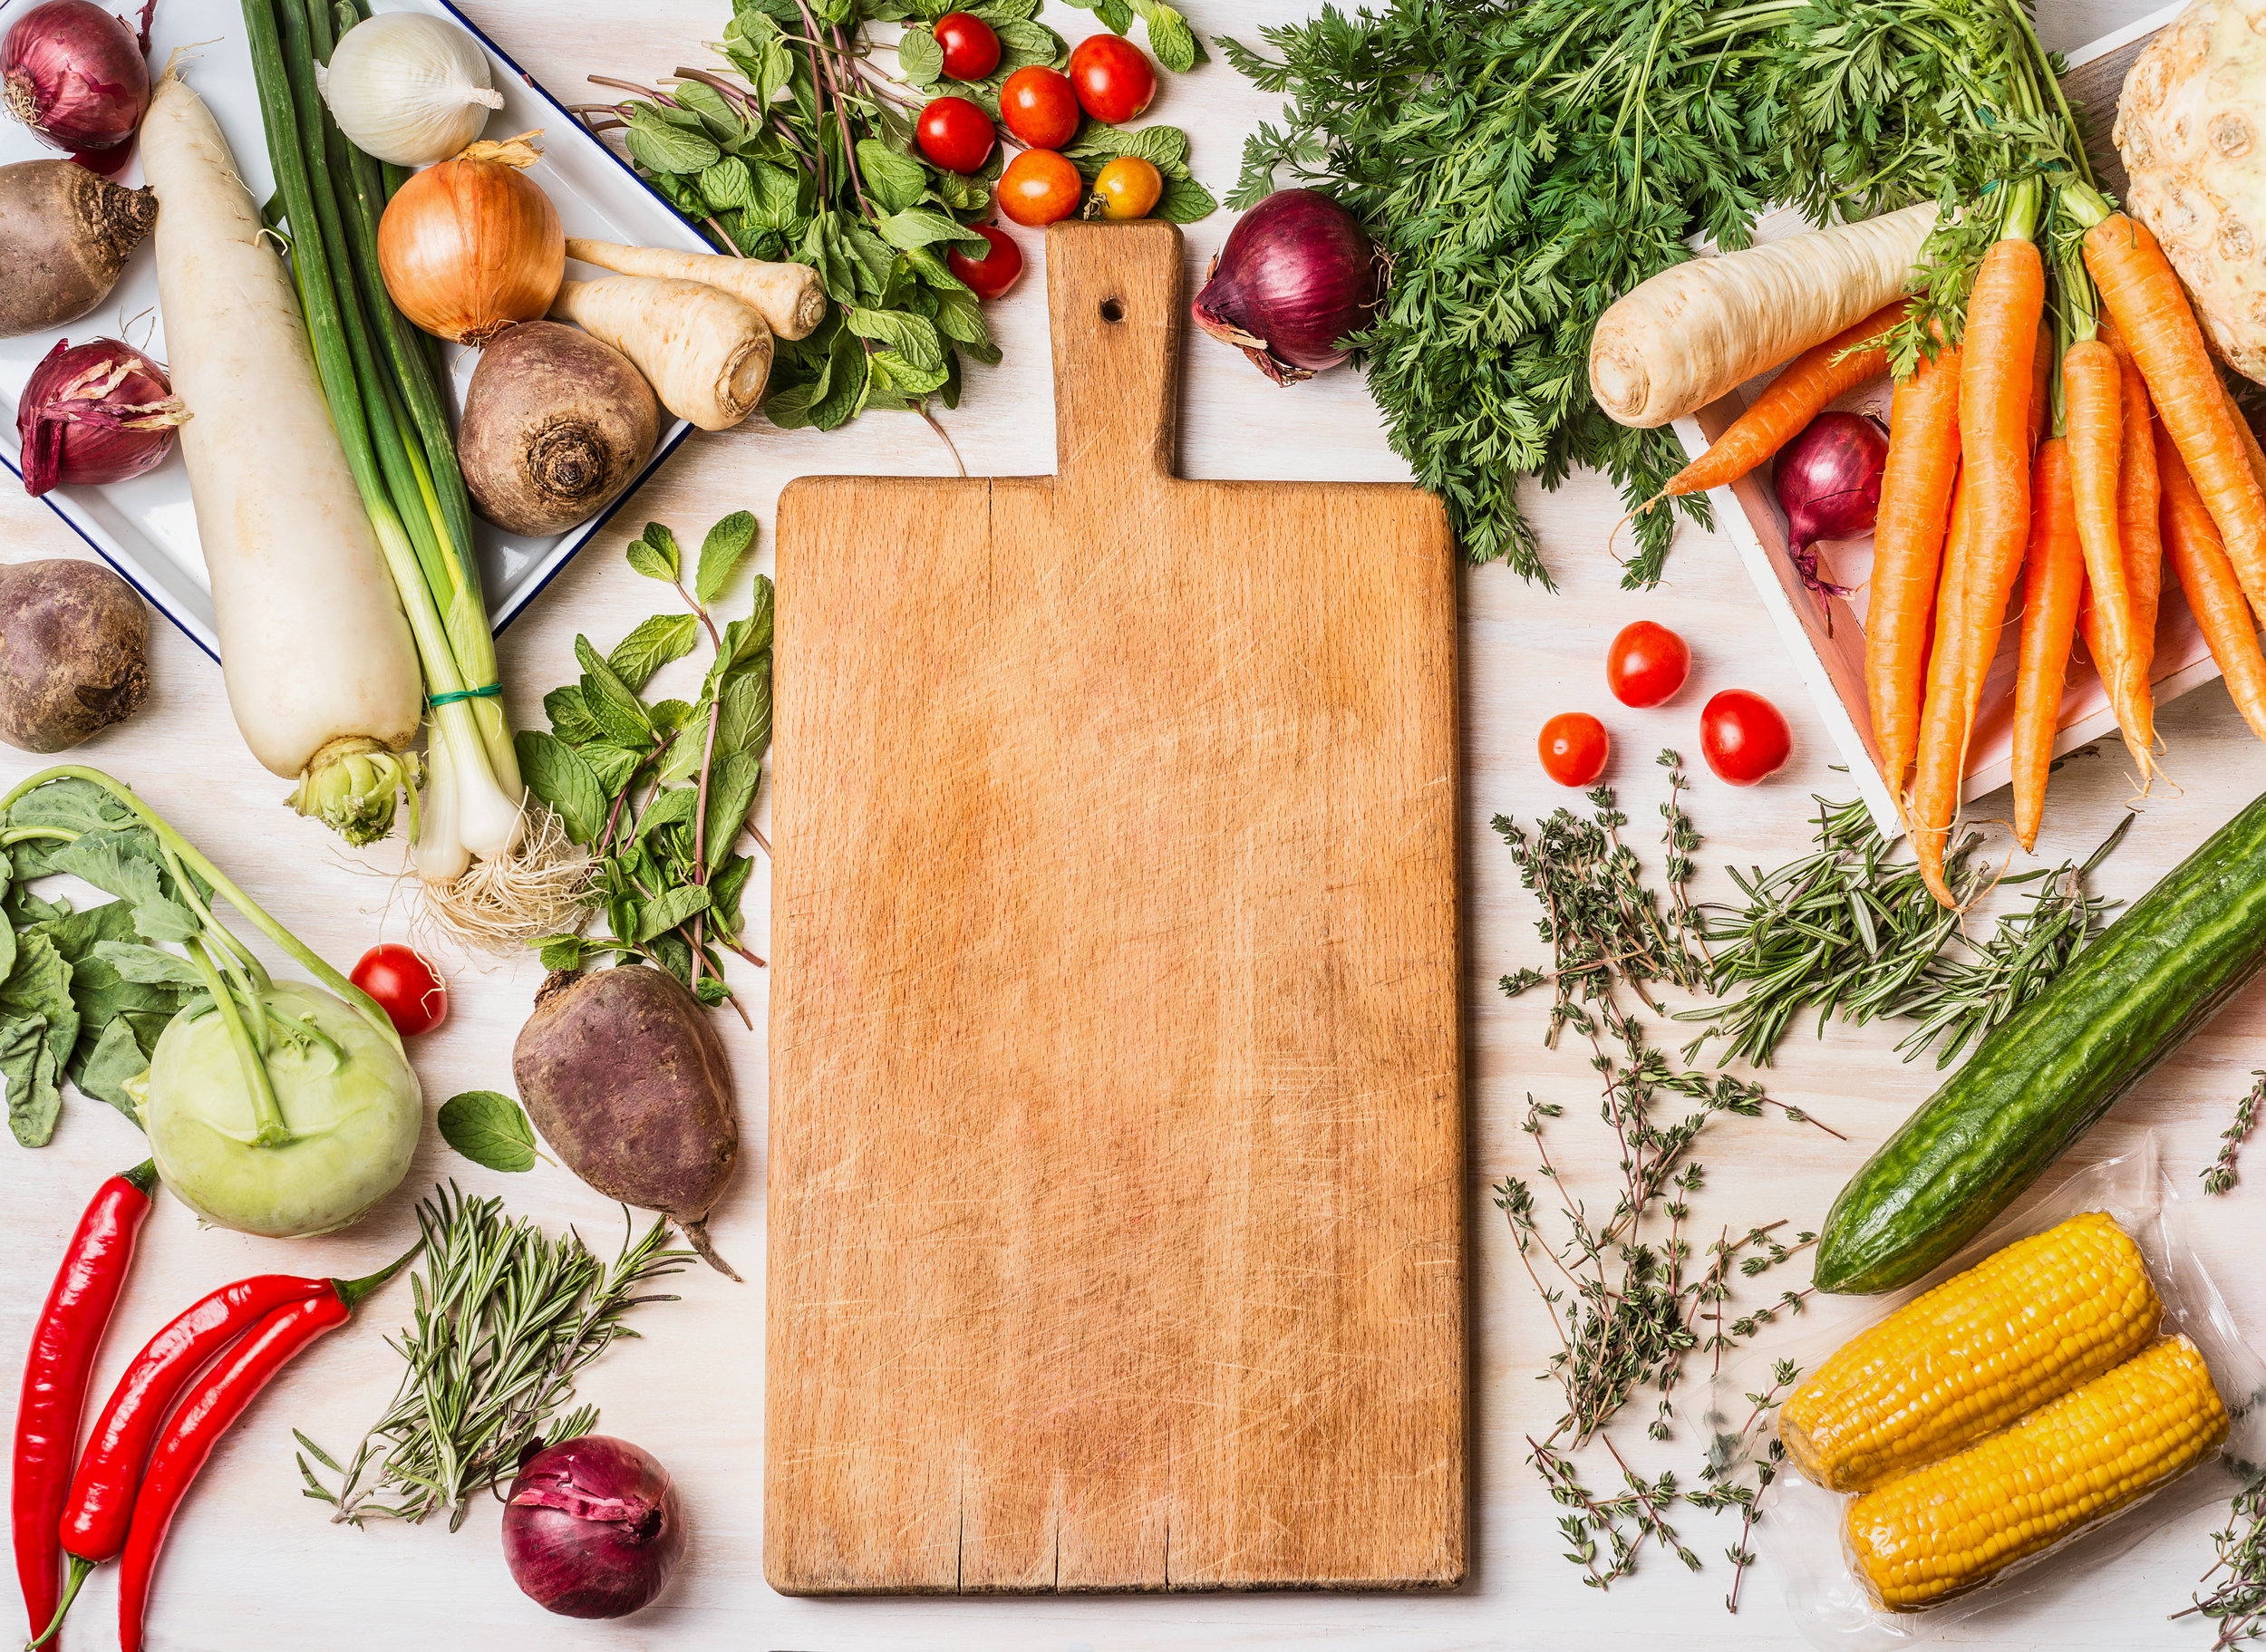 Sundance & Co. - Wellness: Changes in Diet